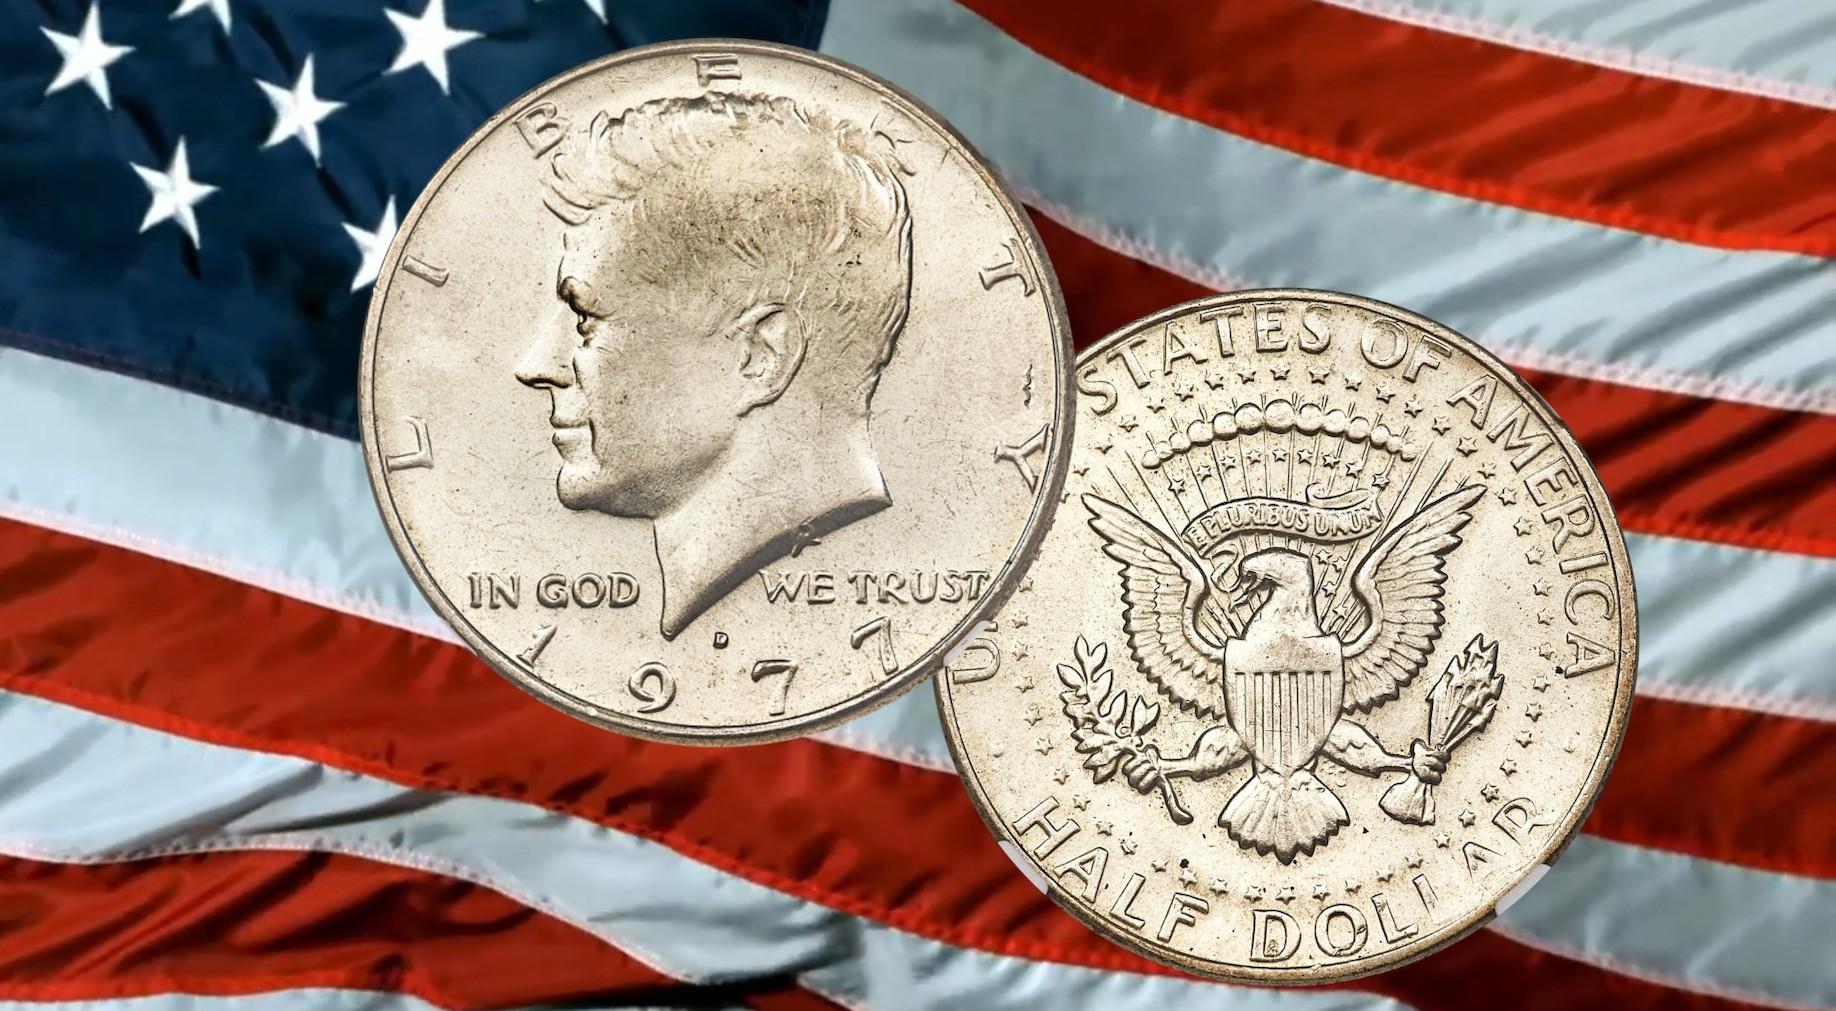 2017-S Brilliant Uncirculated Commemorative Ozark Scenic Riverways 25 Cent Coin!